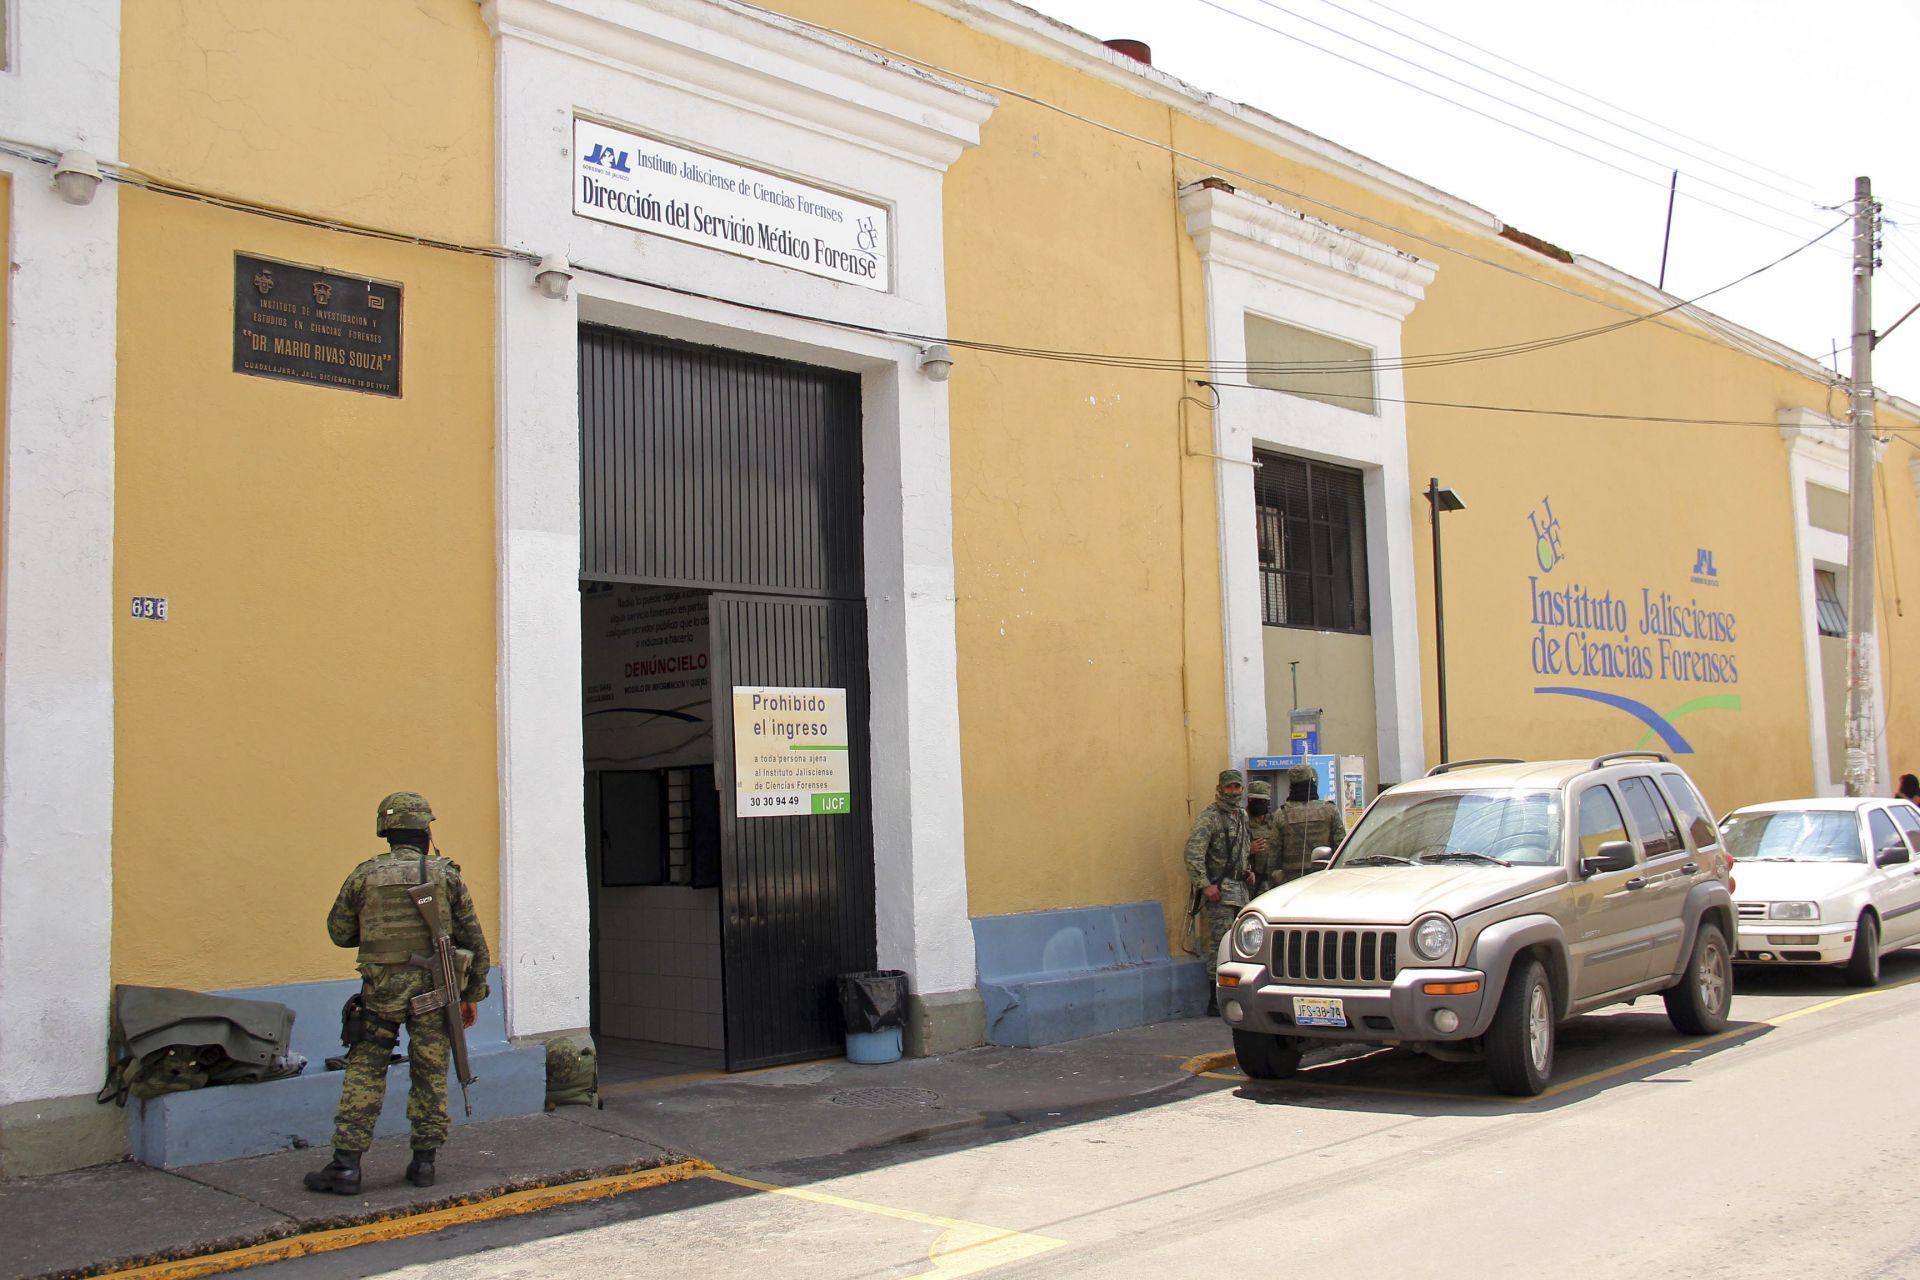 Acusan a policías de Jalisco de detener y asesinar a un hombre por no usar cubrebocas